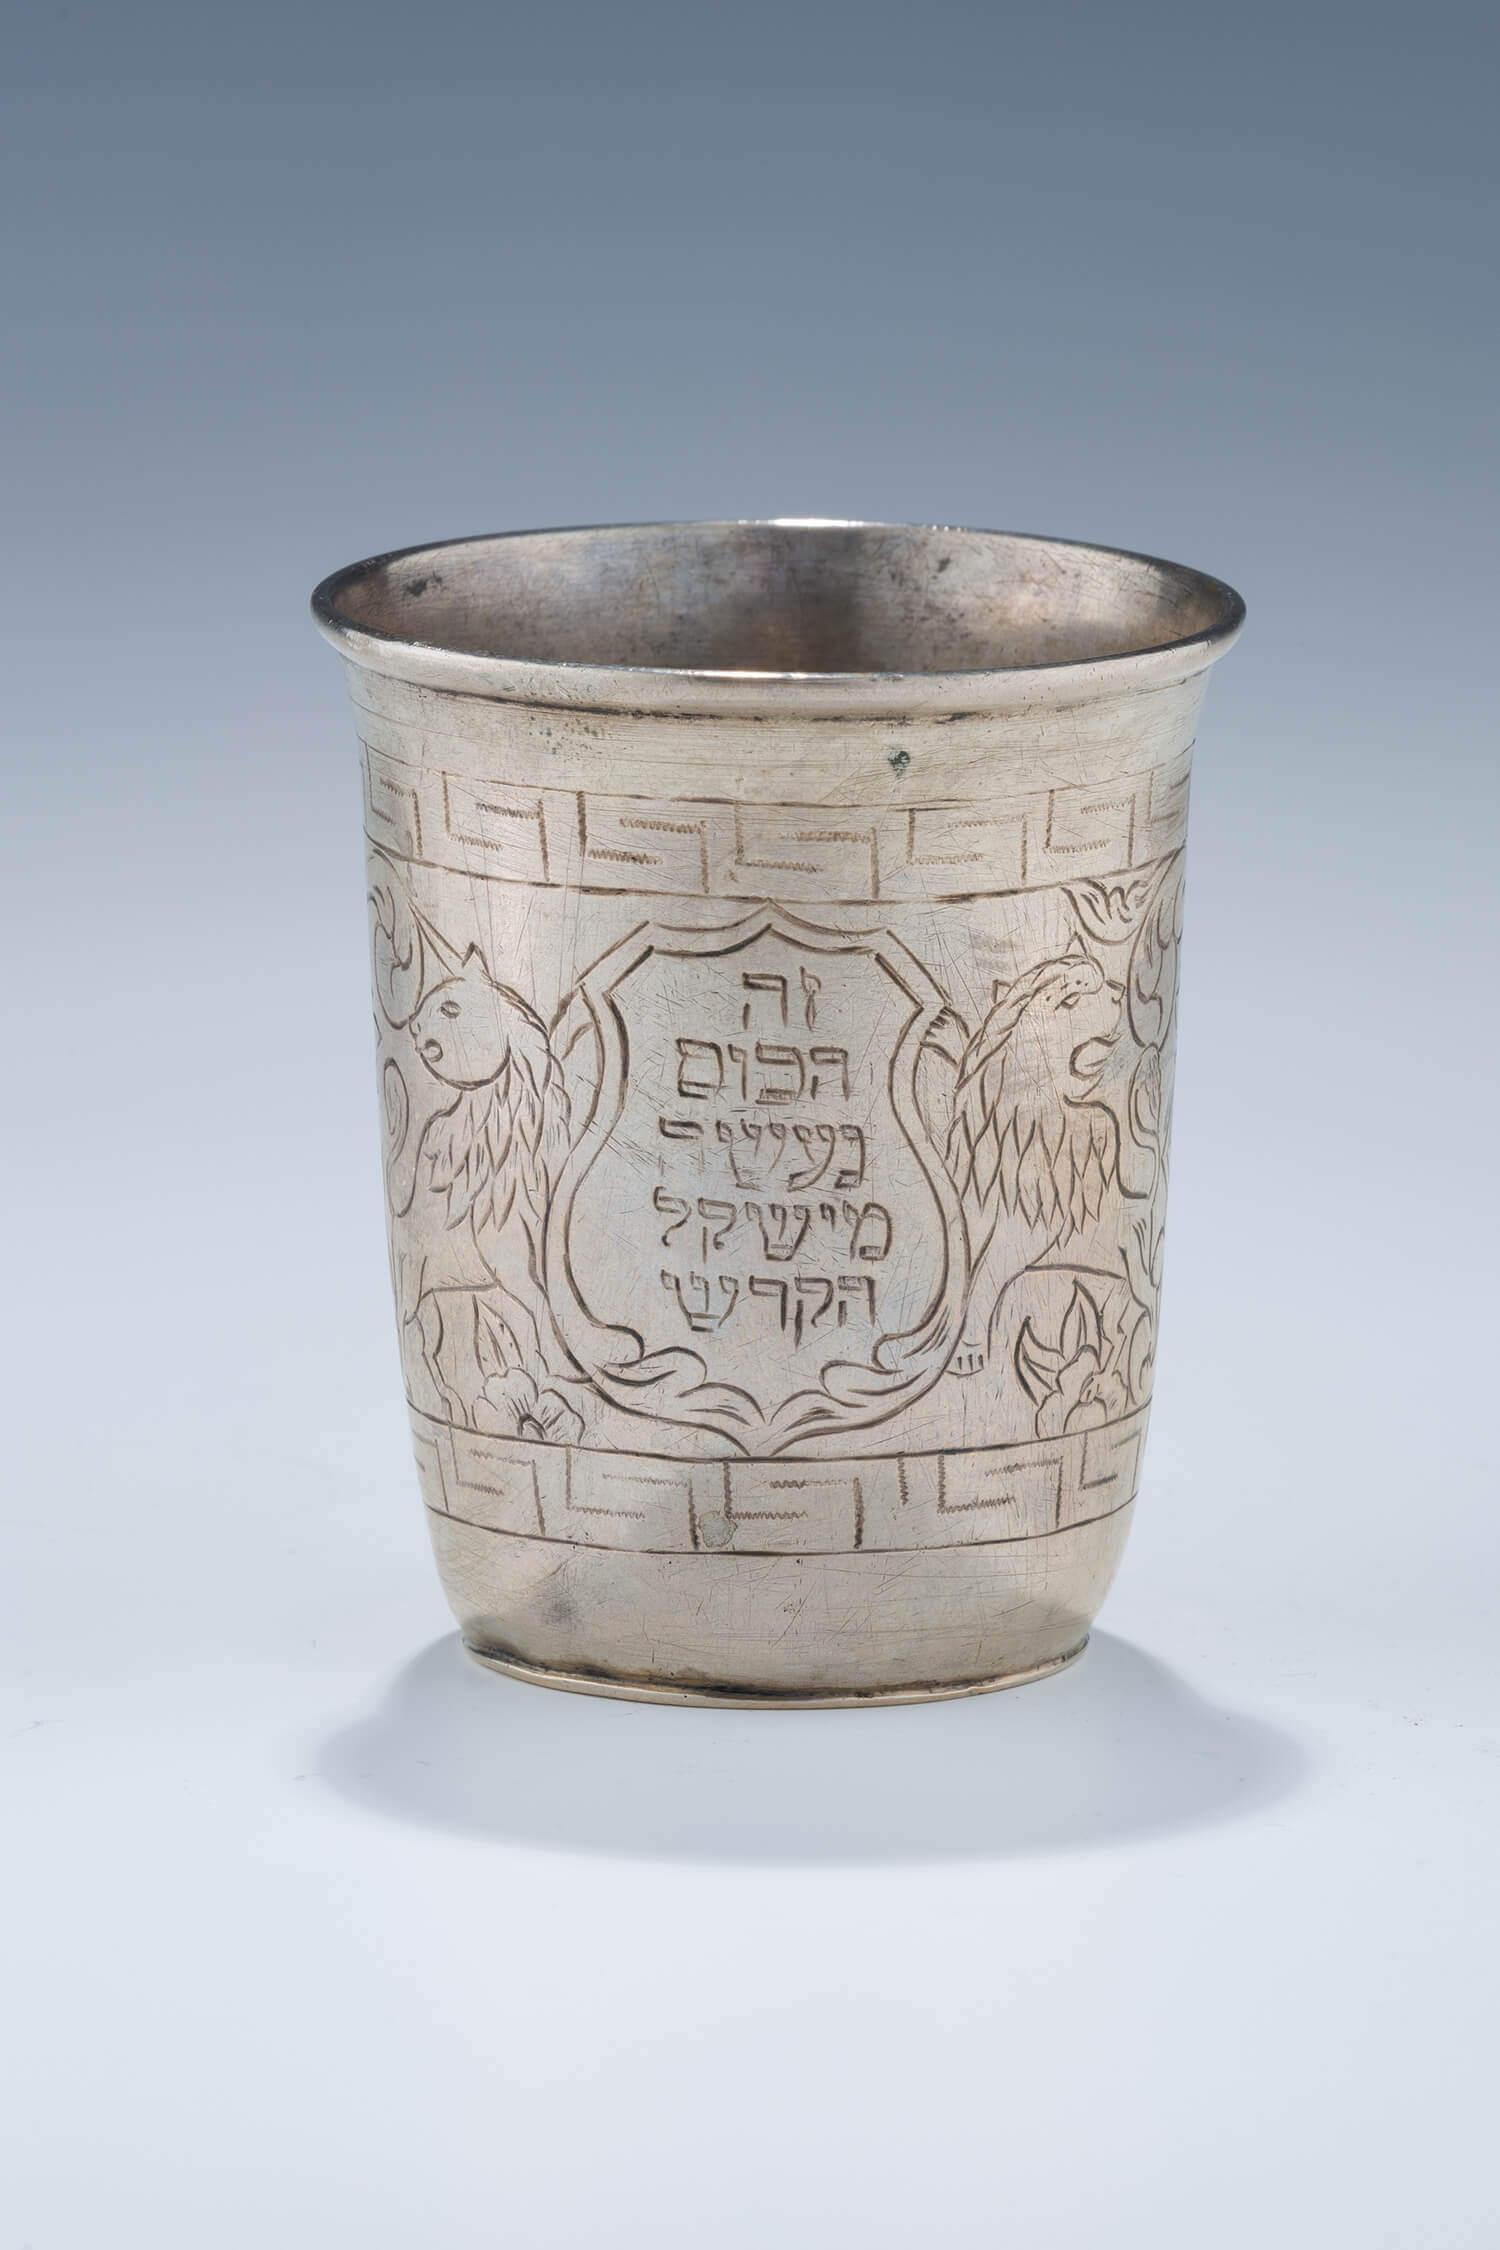 037. A SILVER SHMIROTH CUP